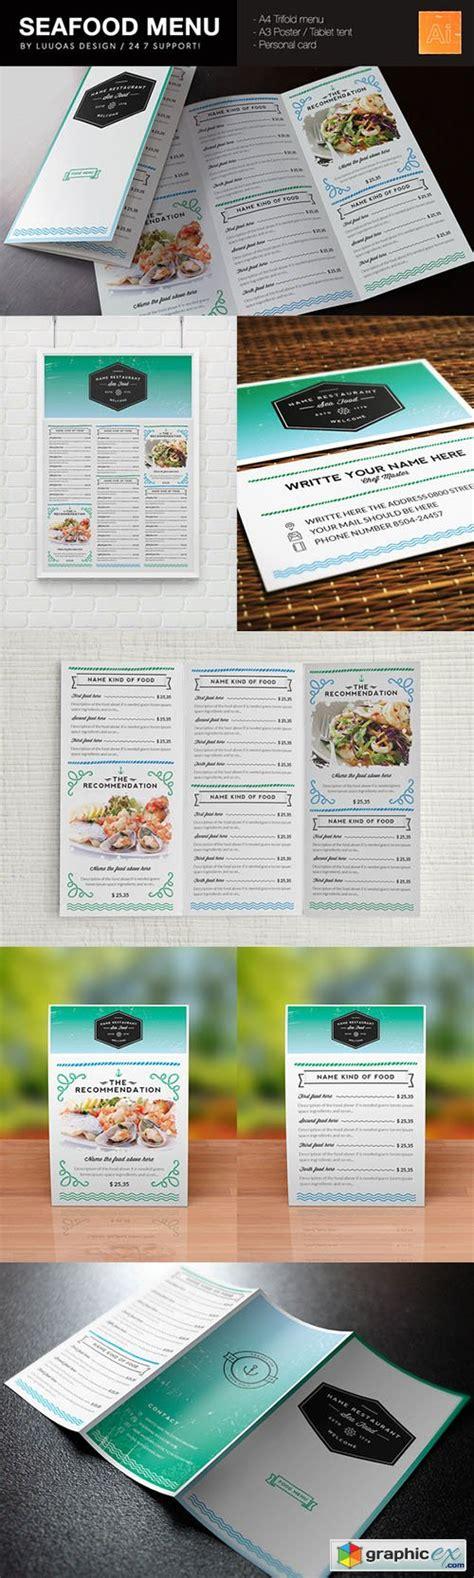 seafood menu template 187 free vector stock image